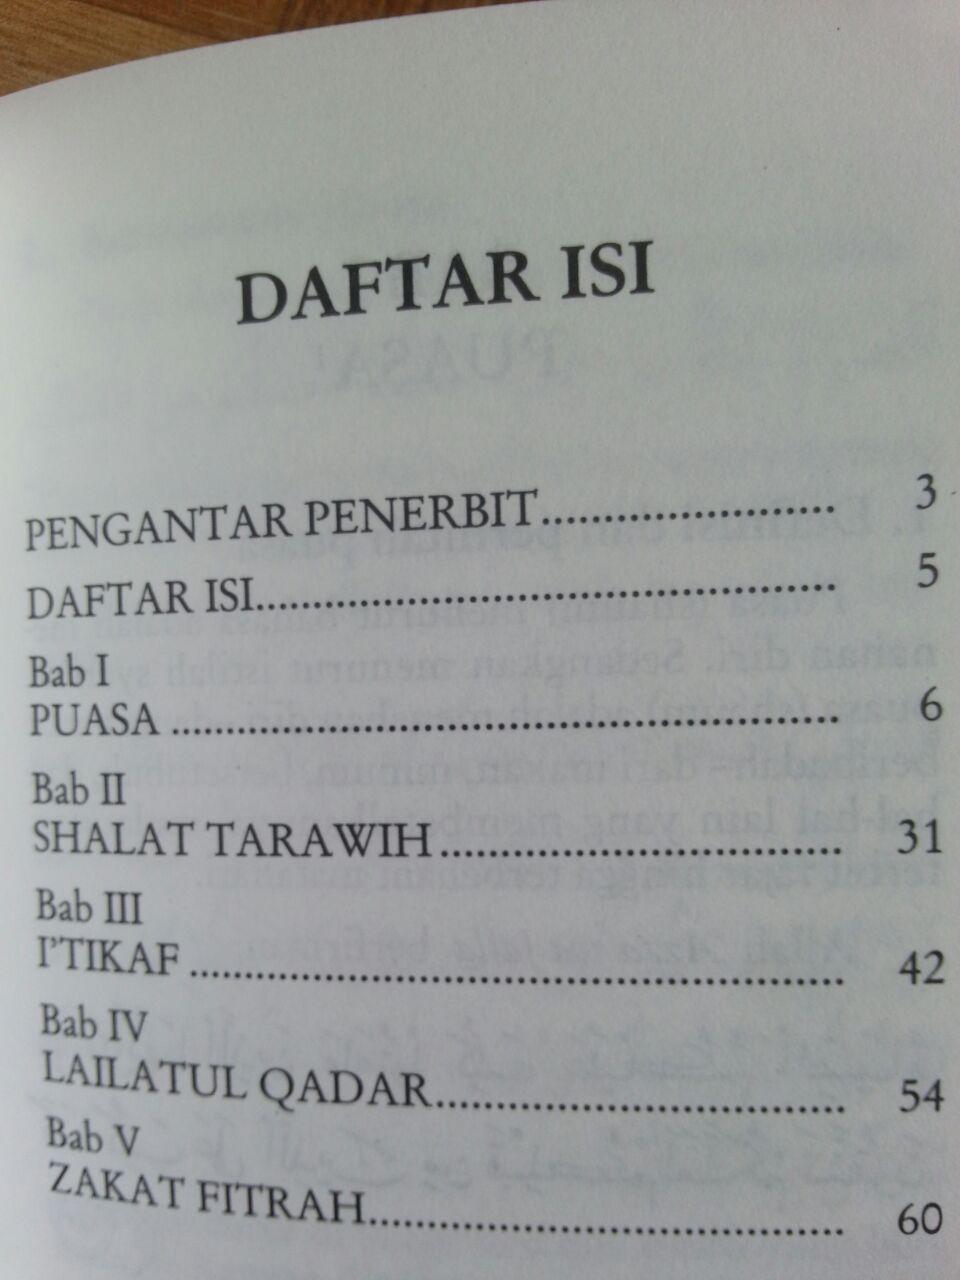 Buku Saku Tuntunan Praktis Puasa Tarawih I'tikaf Lailatul Qadar dan Zakat Fitrah isi 2